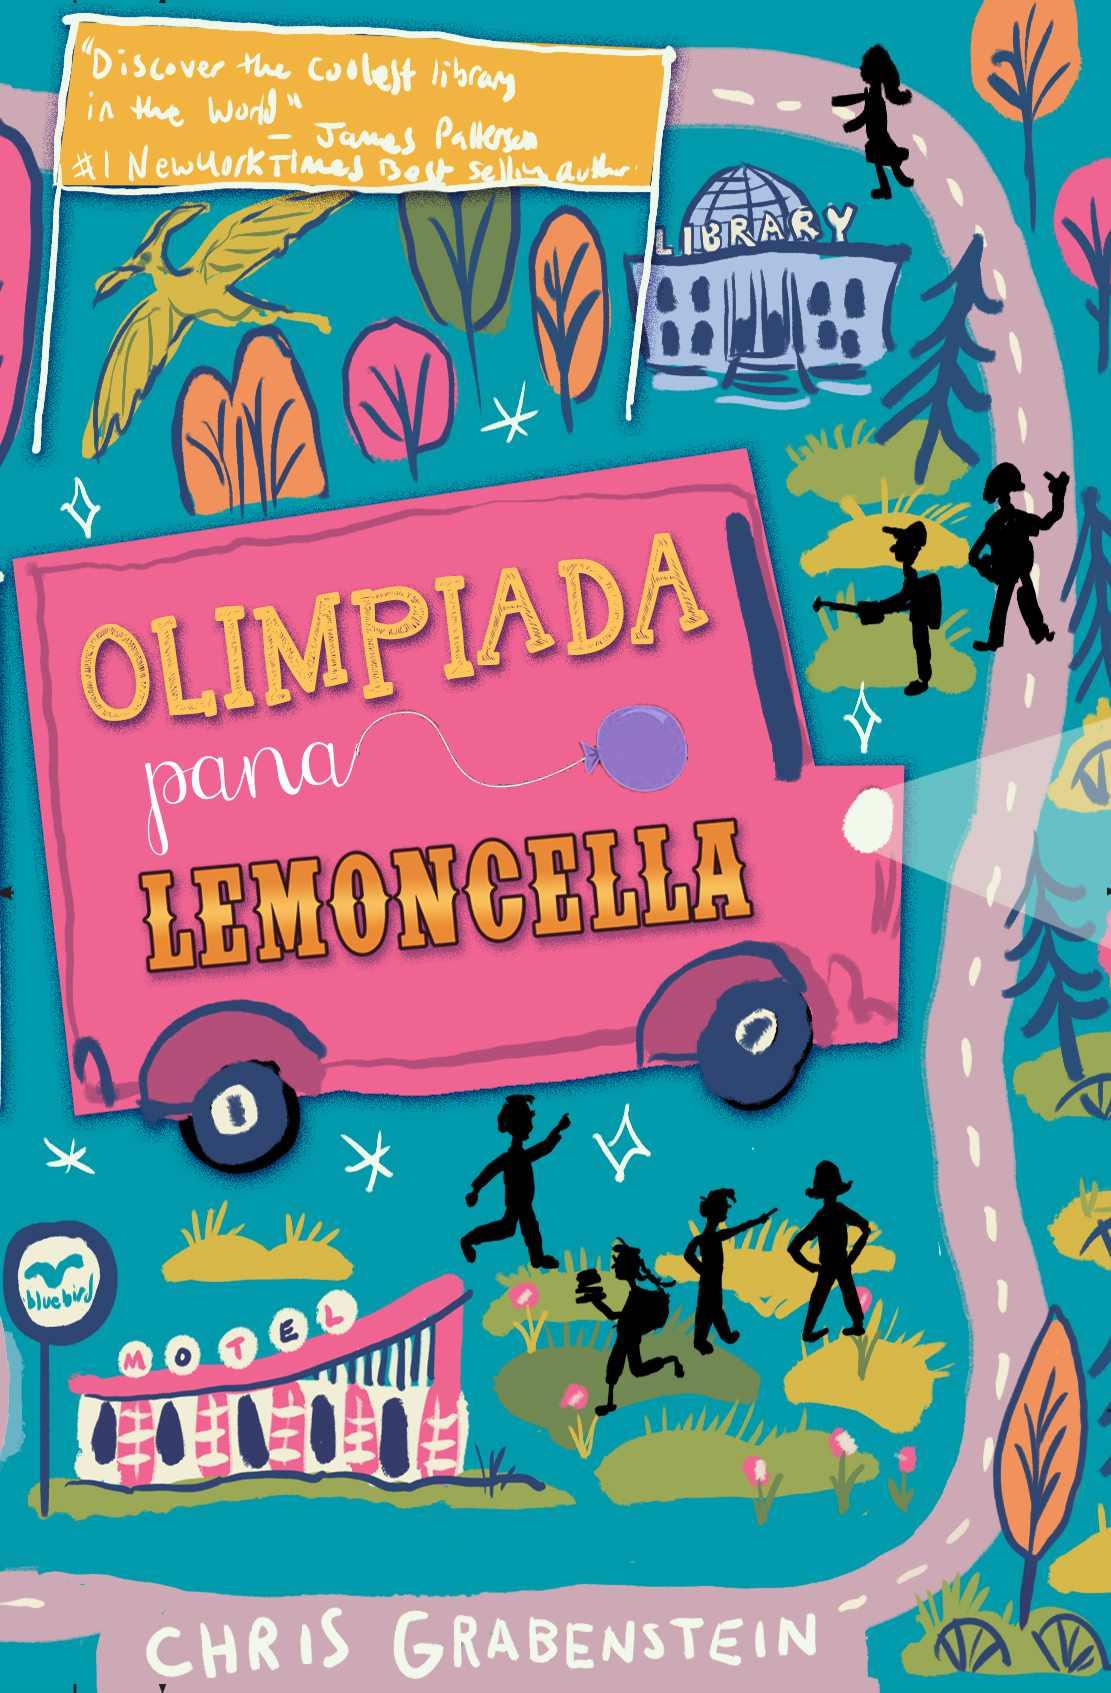 Olimpiada pana Lemoncella - Ebook (Książka na Kindle) do pobrania w formacie MOBI